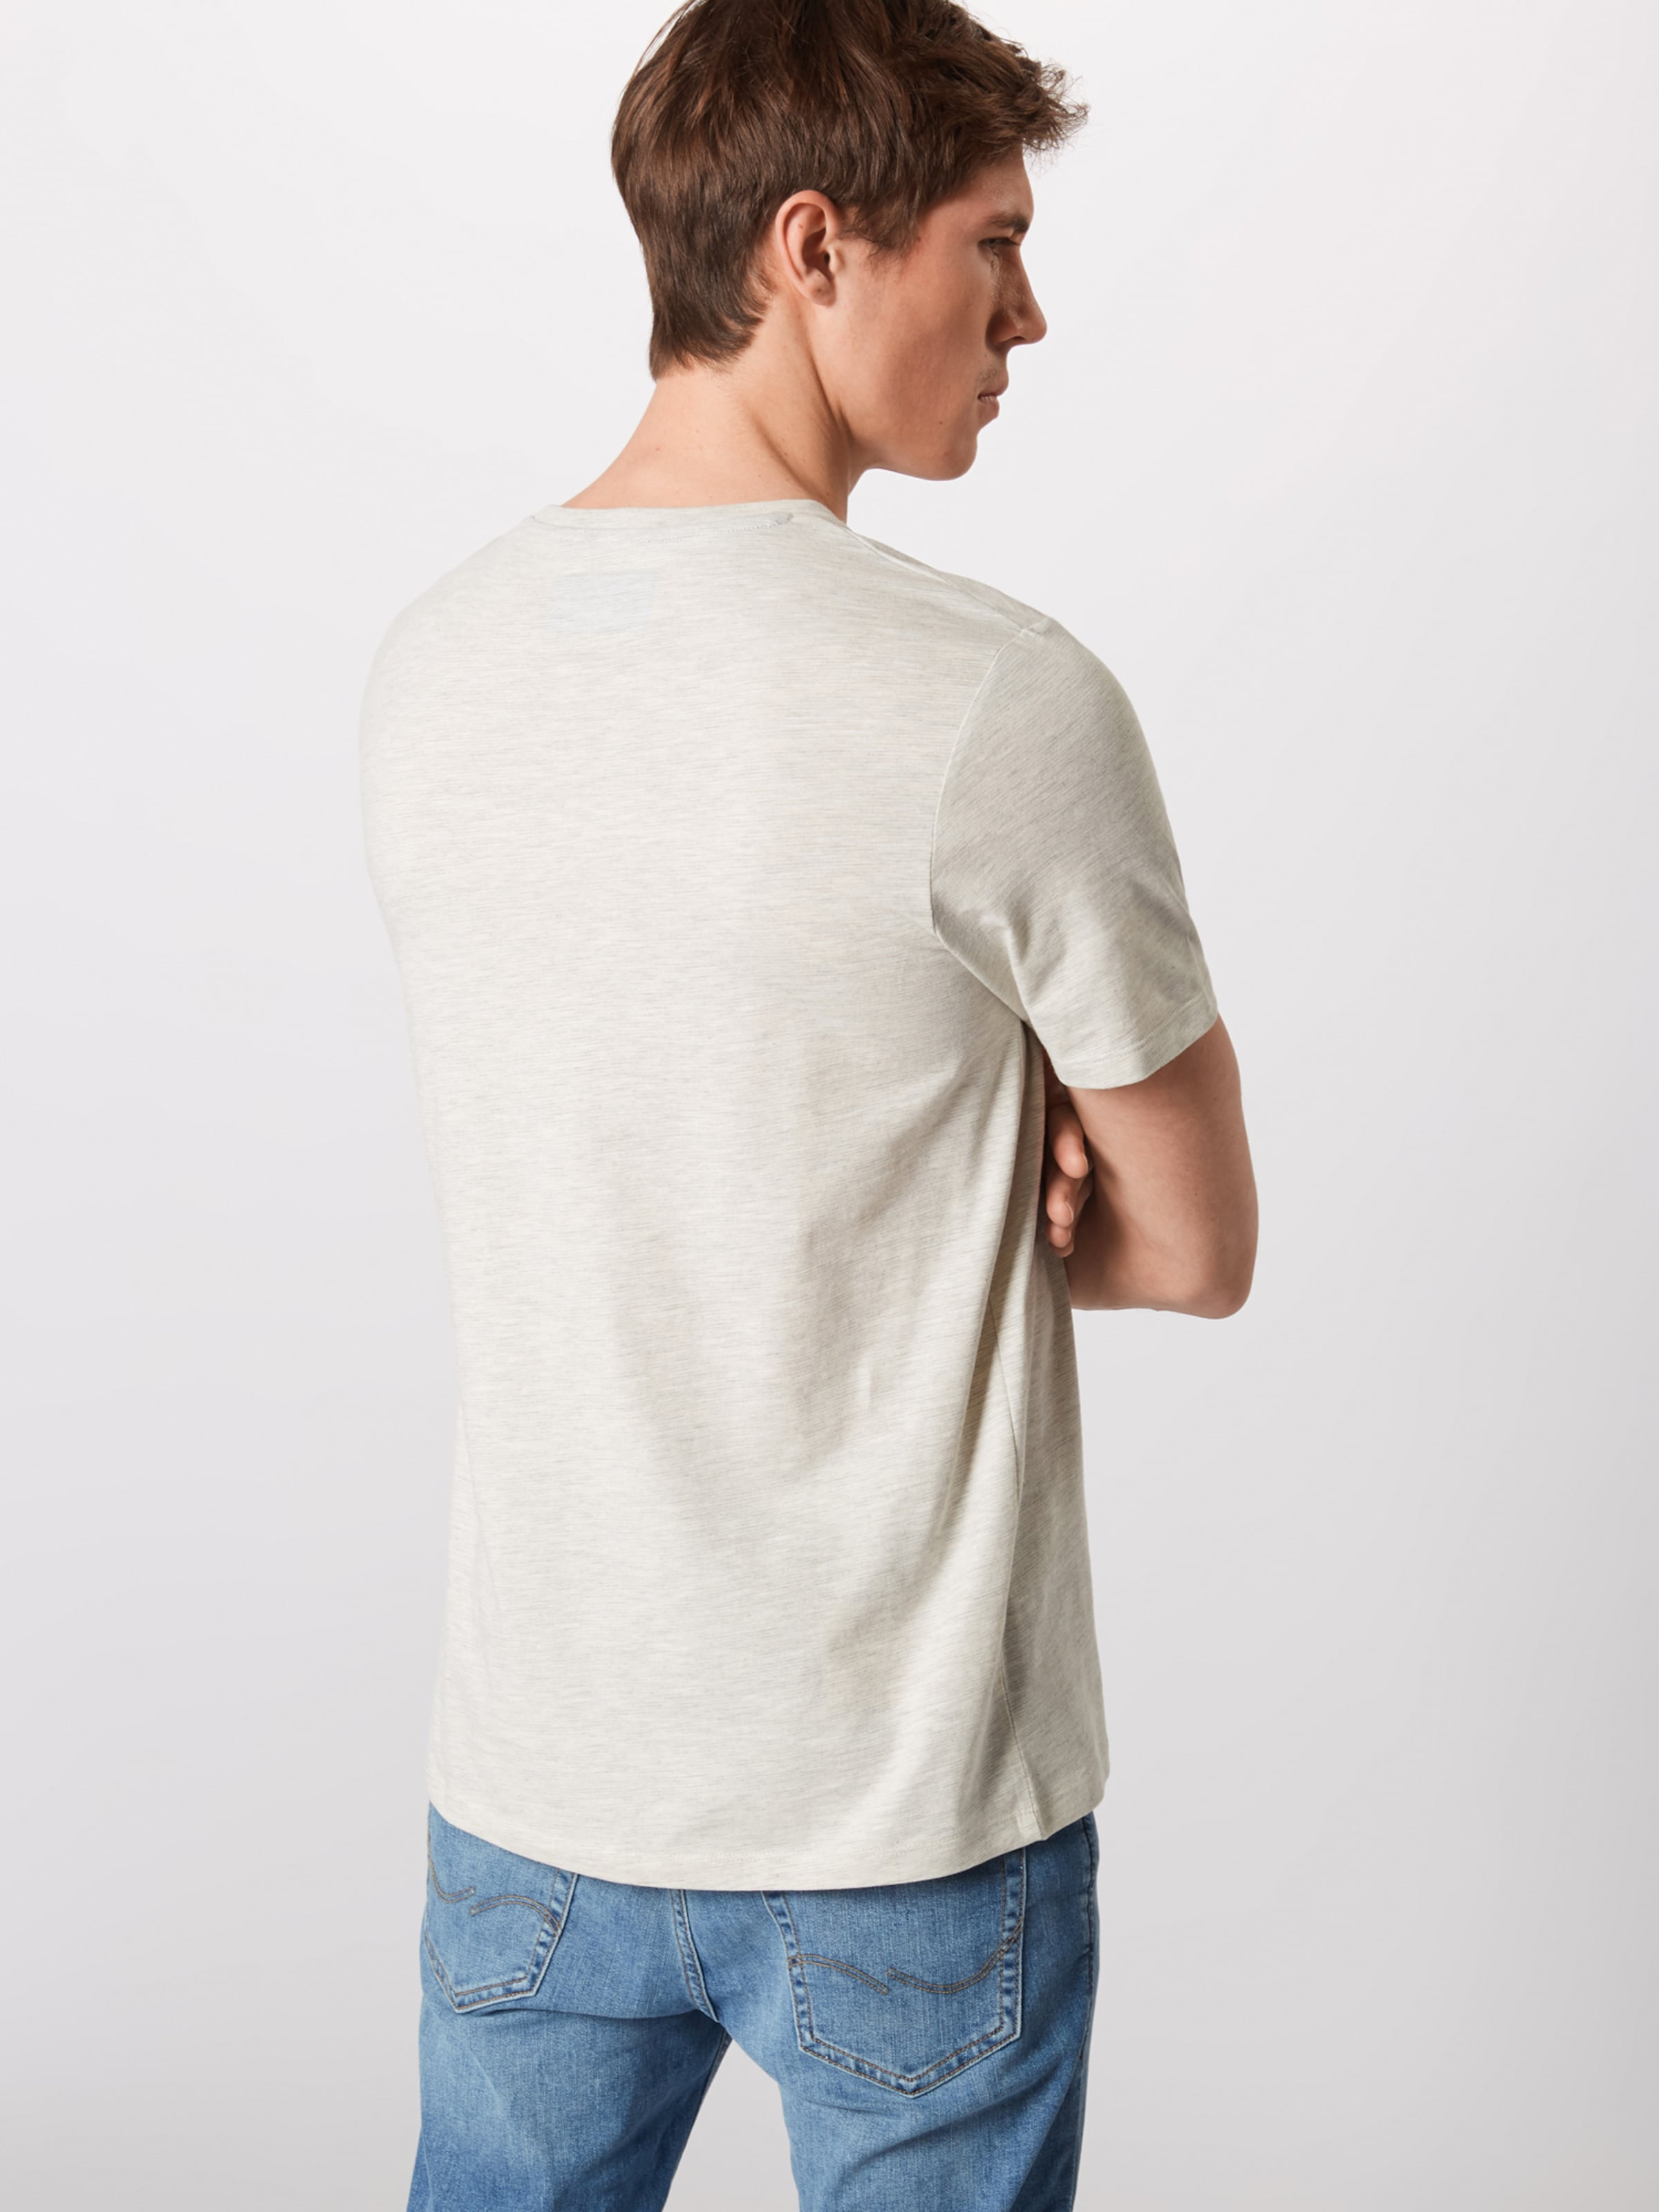 Jackamp; Tee Gris Blanc En 'jcomick Neck' shirt Ss Bleu NuitCiel Jones T Crew lF1JcTK3u5